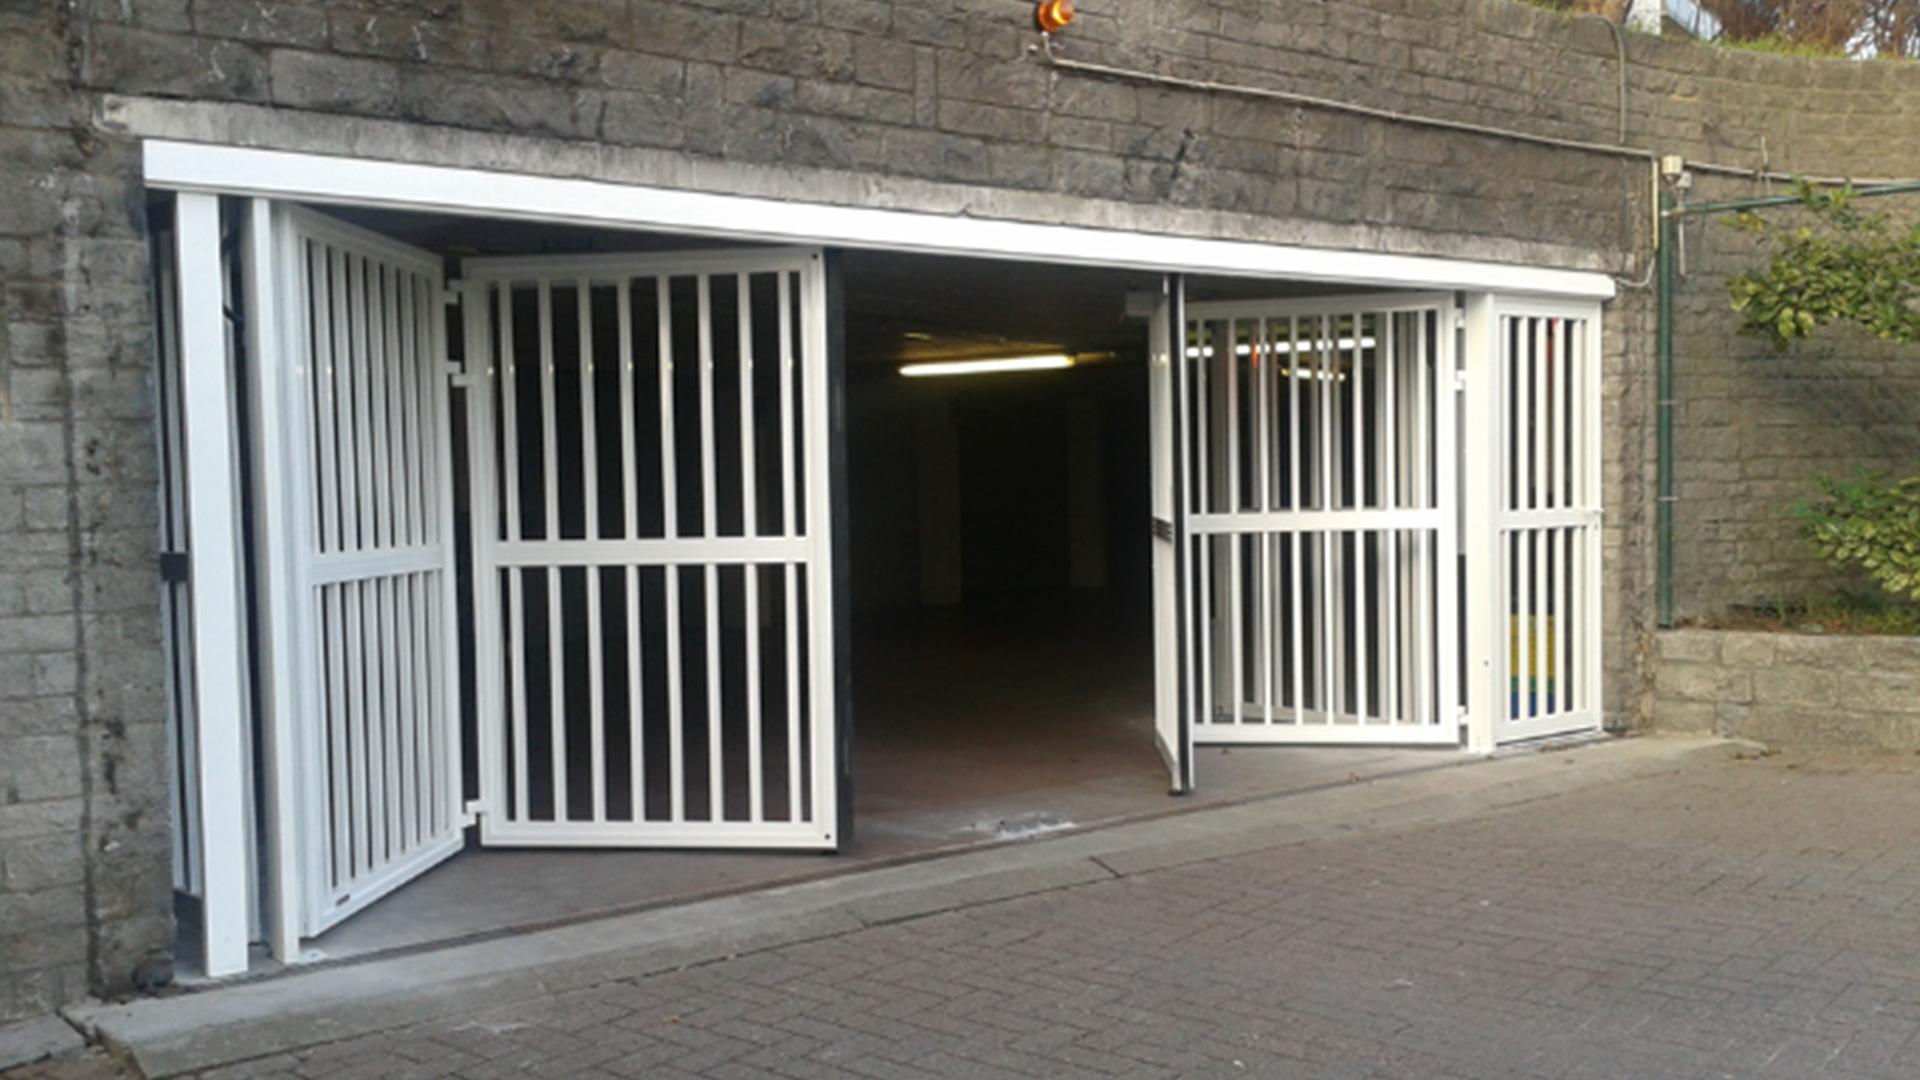 All access porte garage parking laterale usage intensif for Parking f porte de versailles